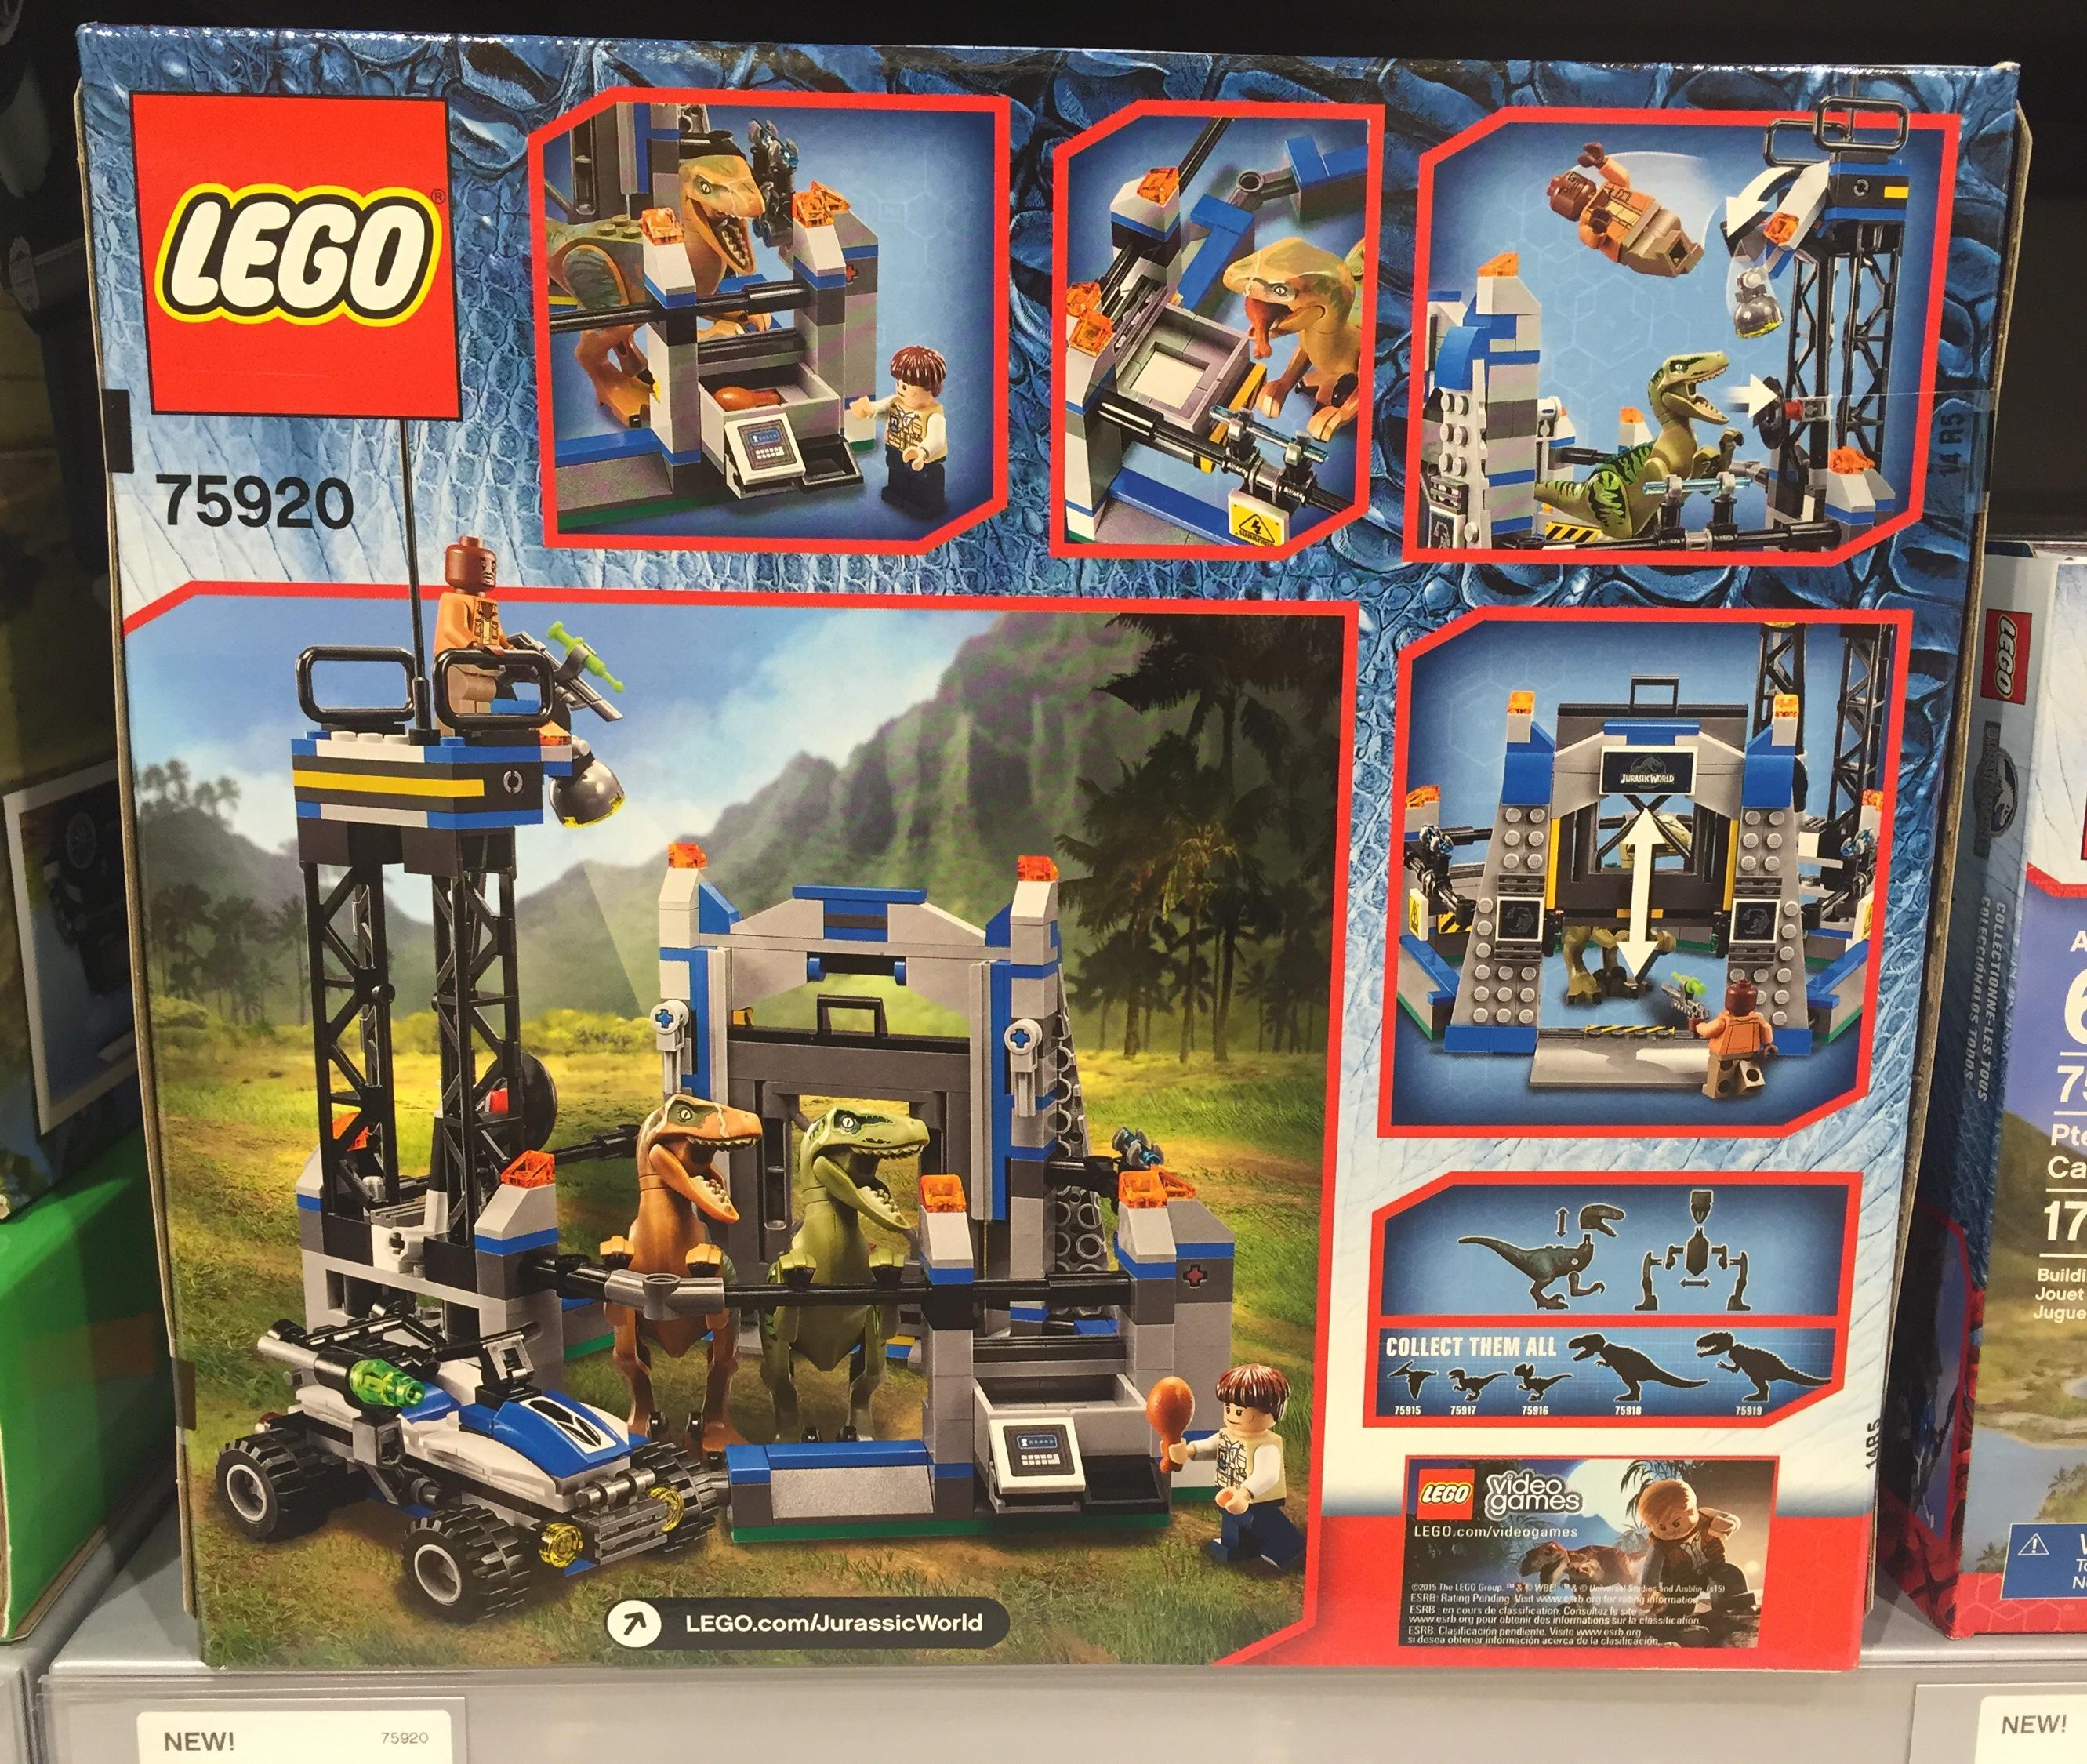 75920 Raptor Escape LEGO Jurassic World Set Box Back